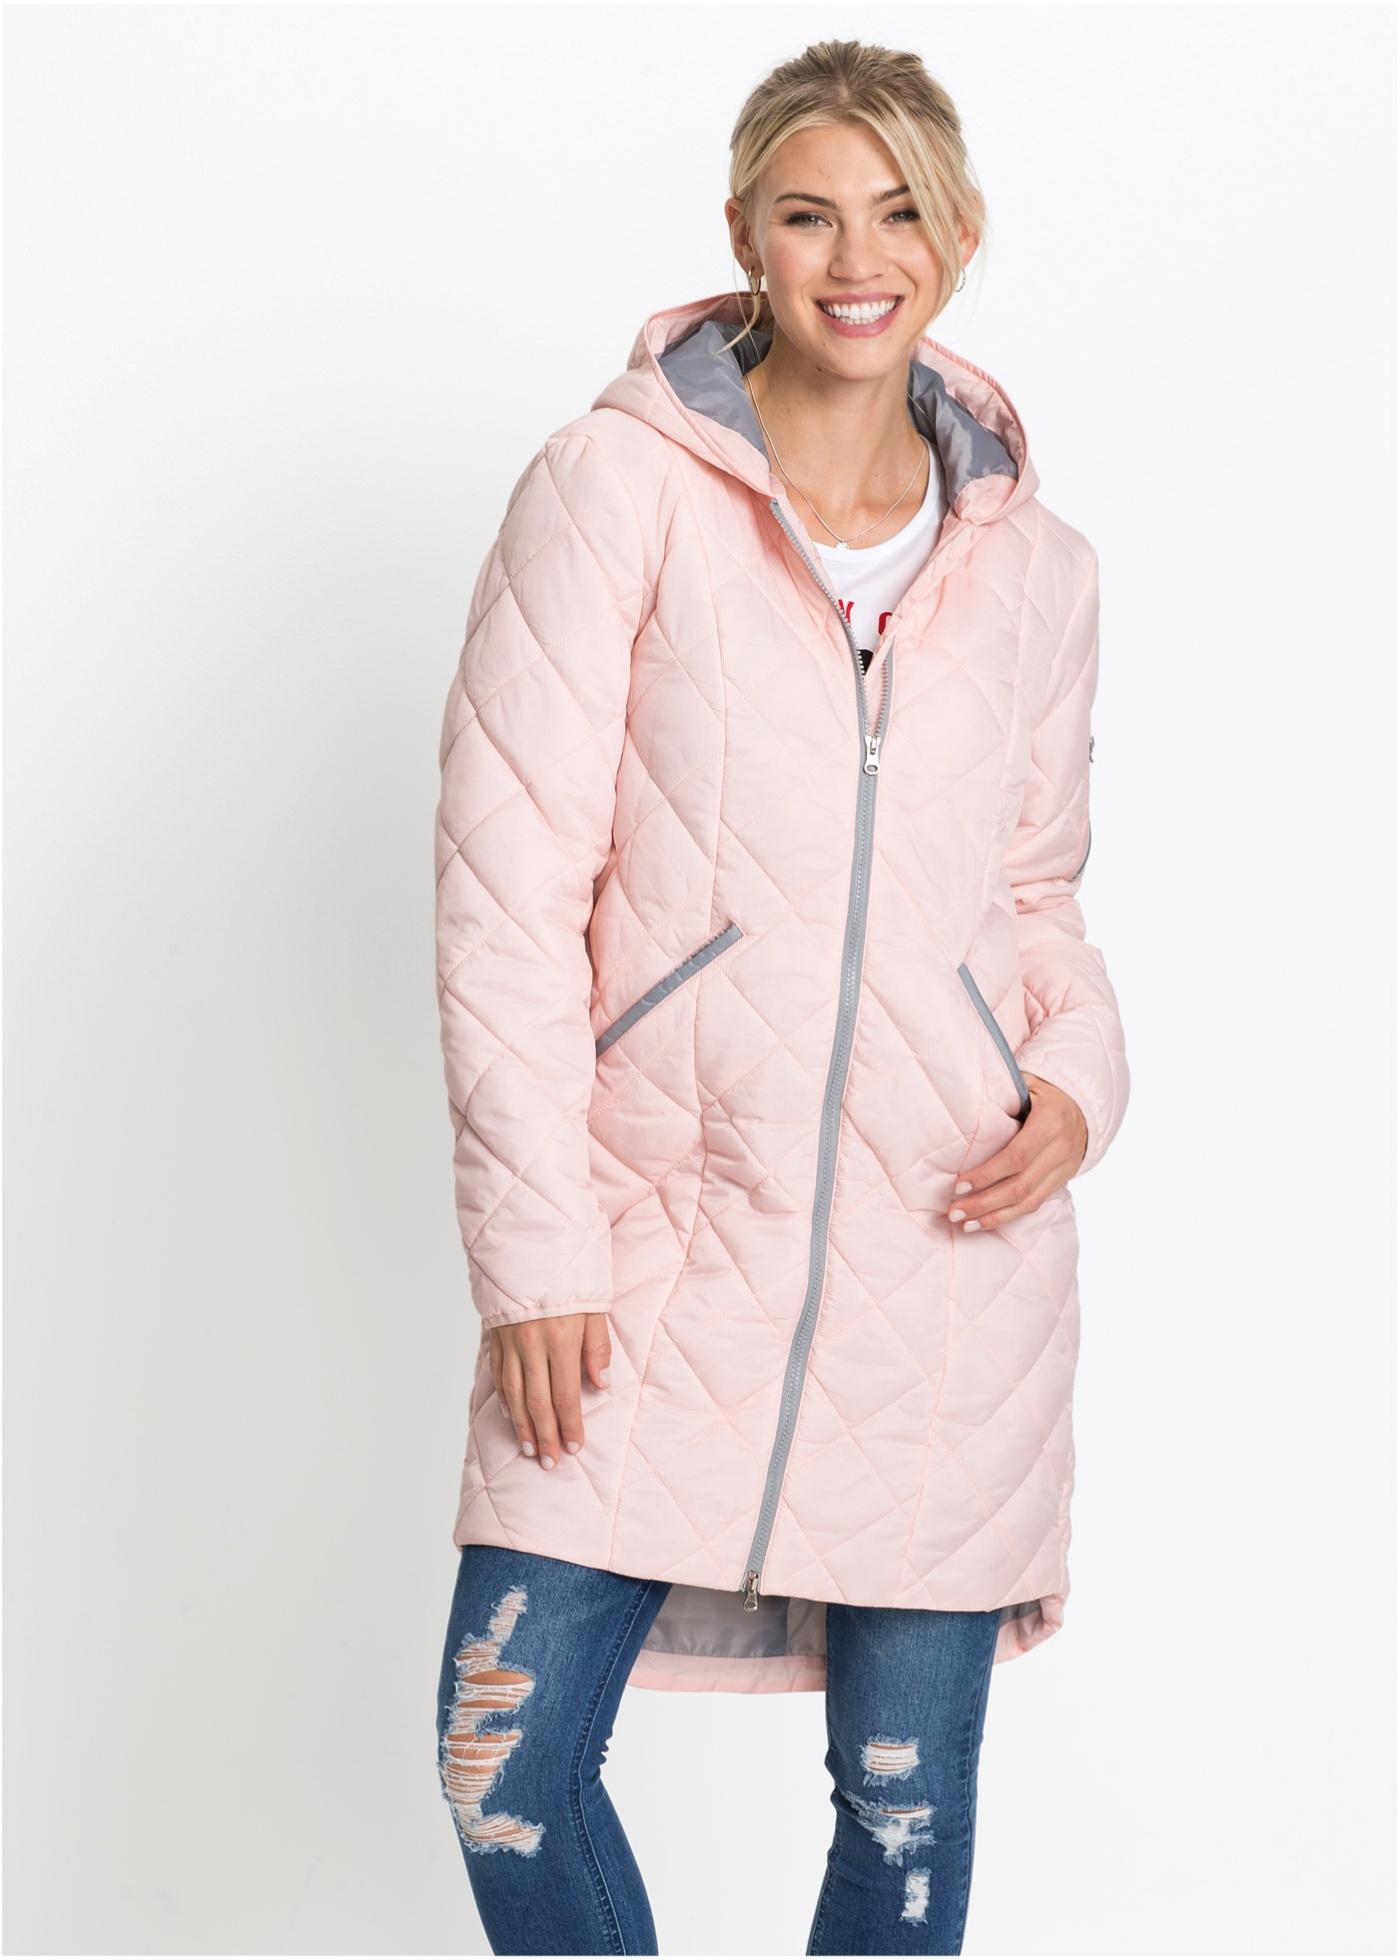 Prošívaný kabát, dvoubarevný - Růžová